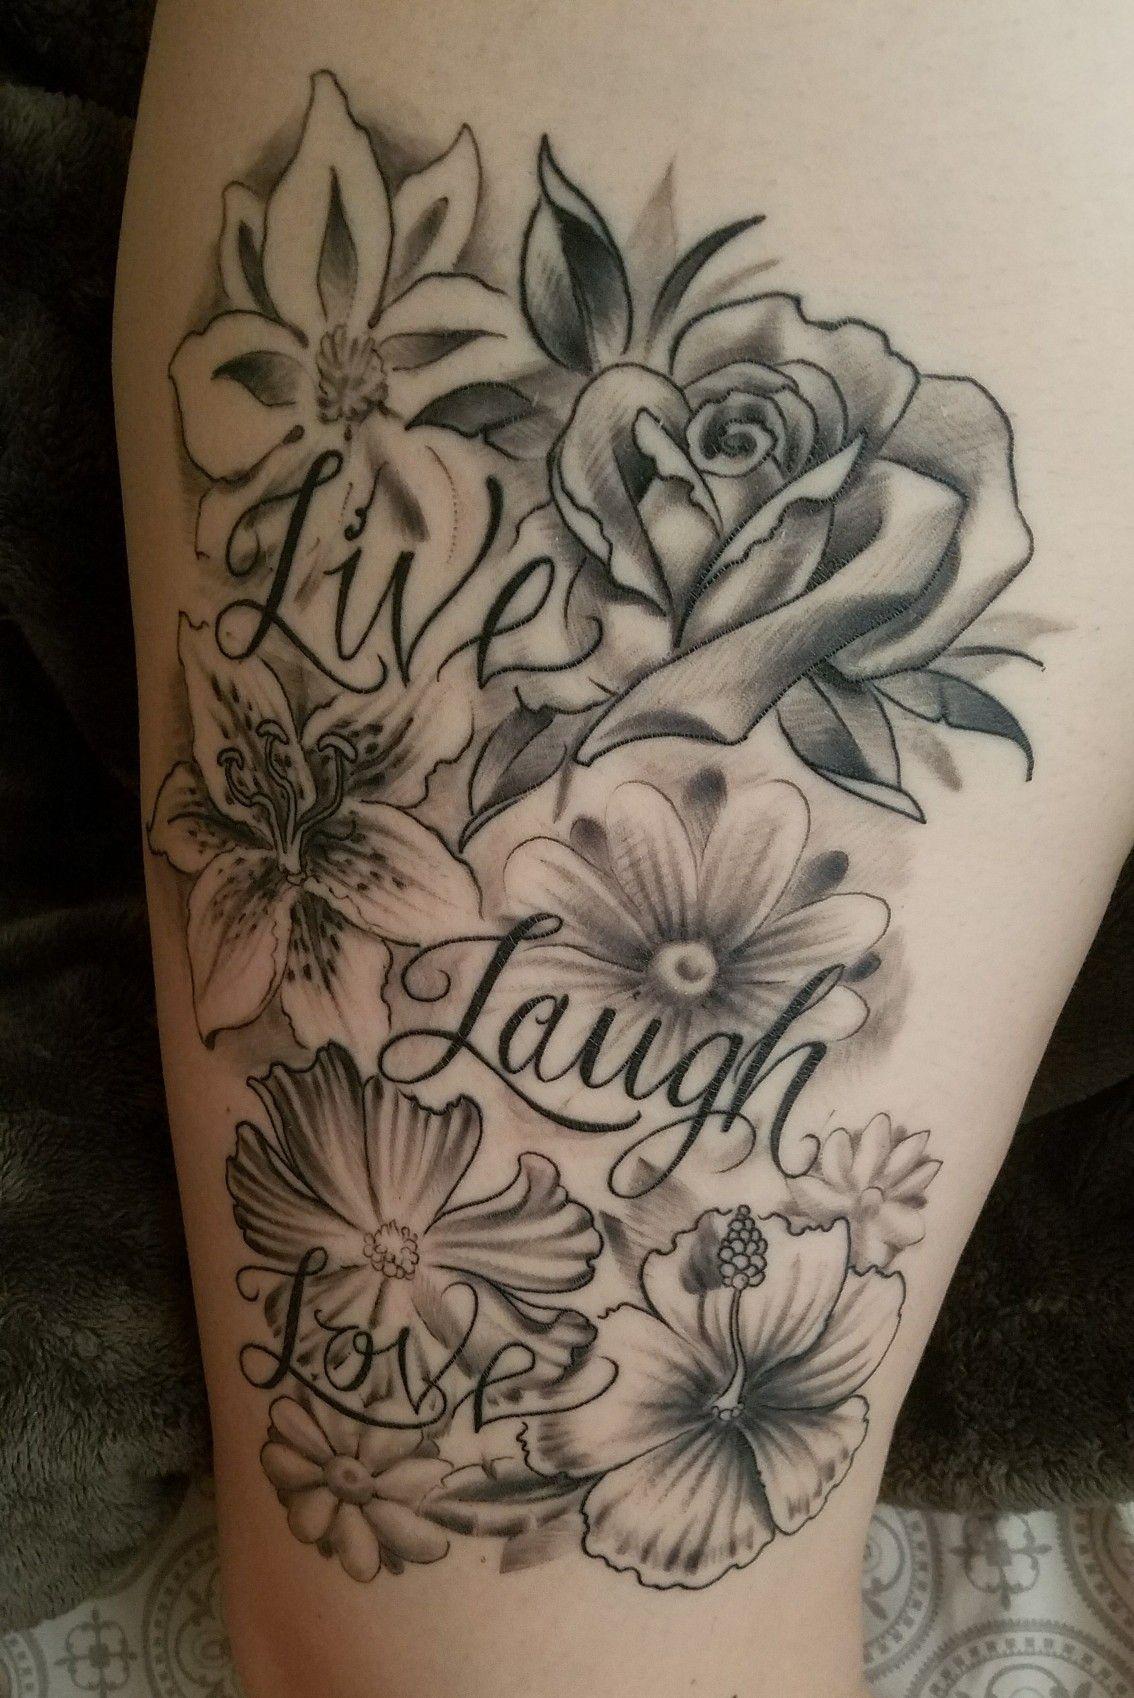 flowers tattoo thightattoo cosmo rose lily daisy sunflower